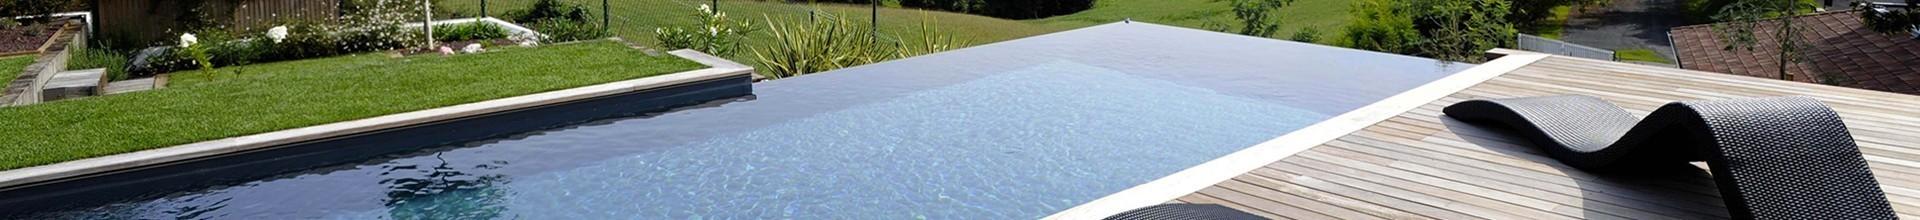 Direct usine, piscine coque prix Bouches-du-Rhône